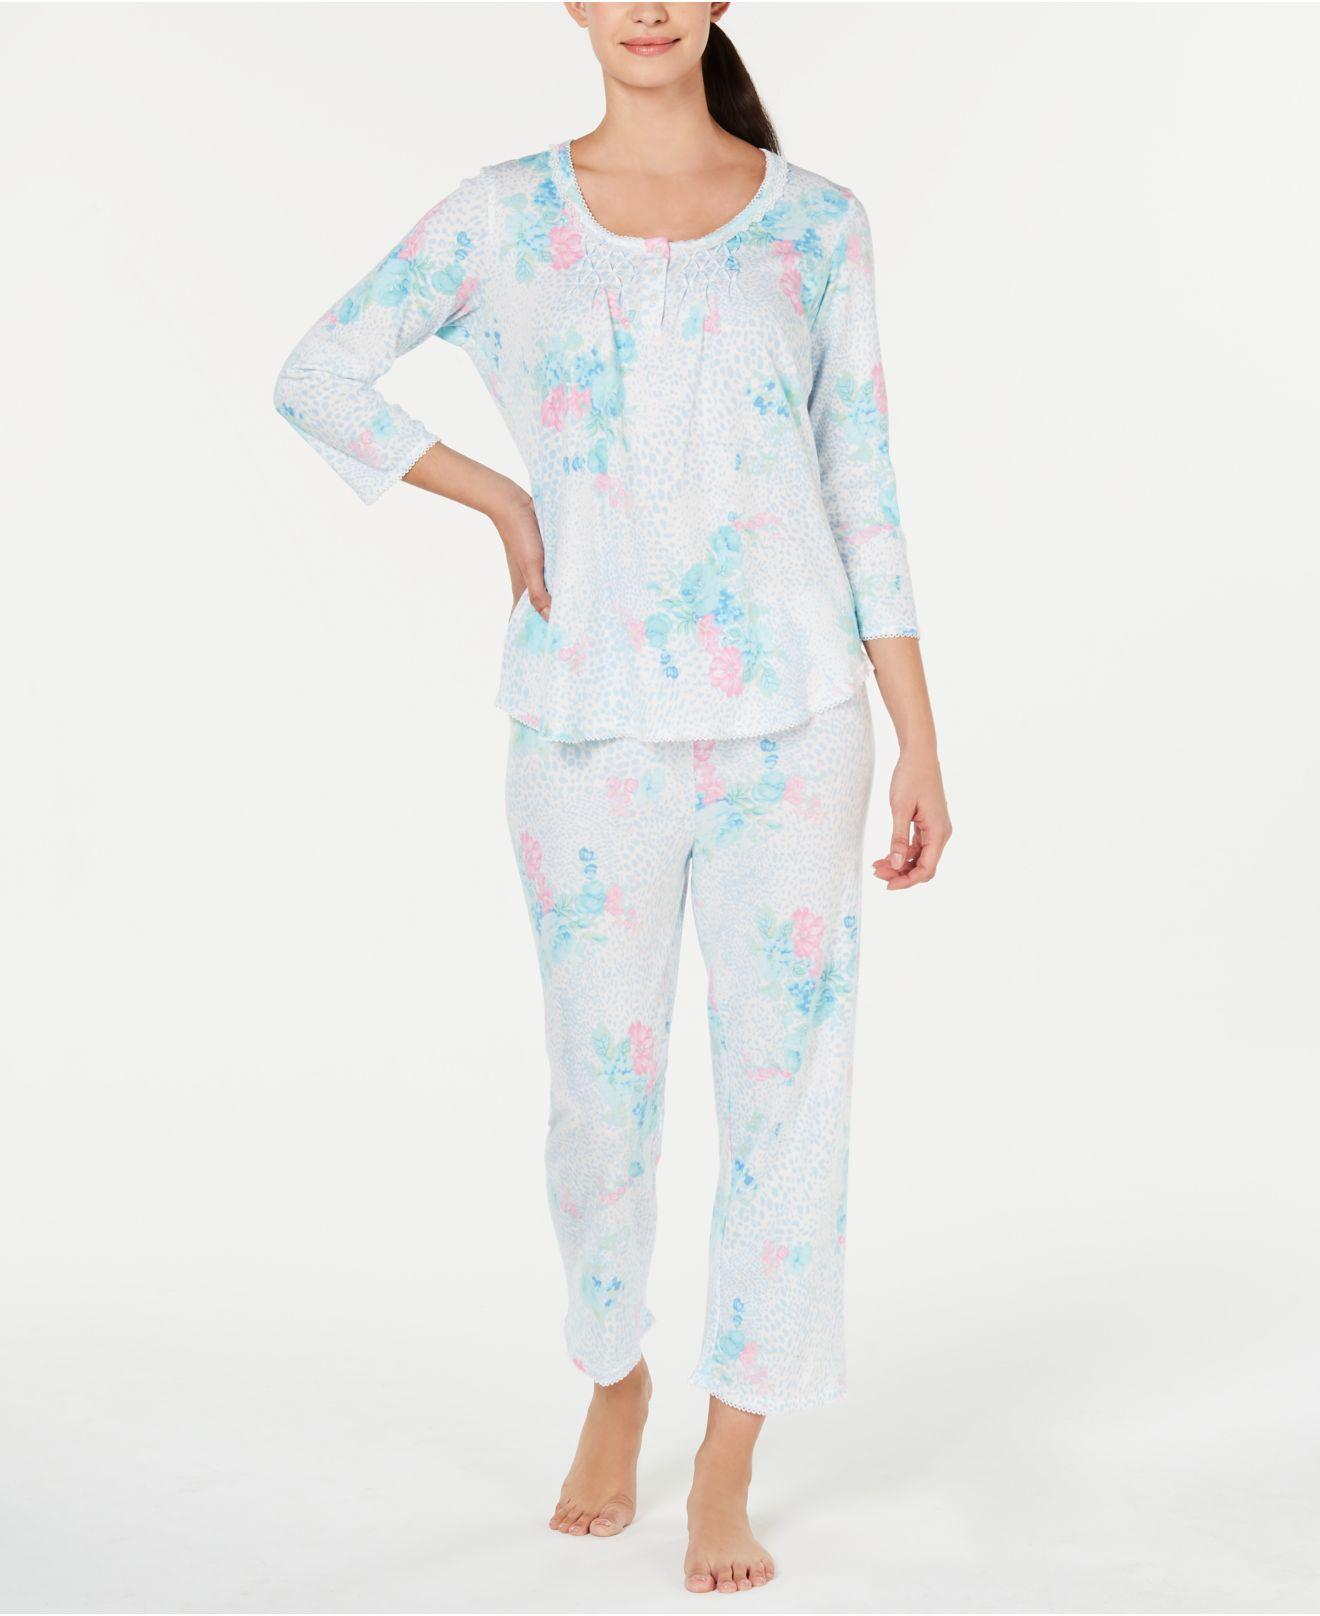 6f77d10d89 Lyst - Miss Elaine Printed Top   Pajama Pants Set in Blue